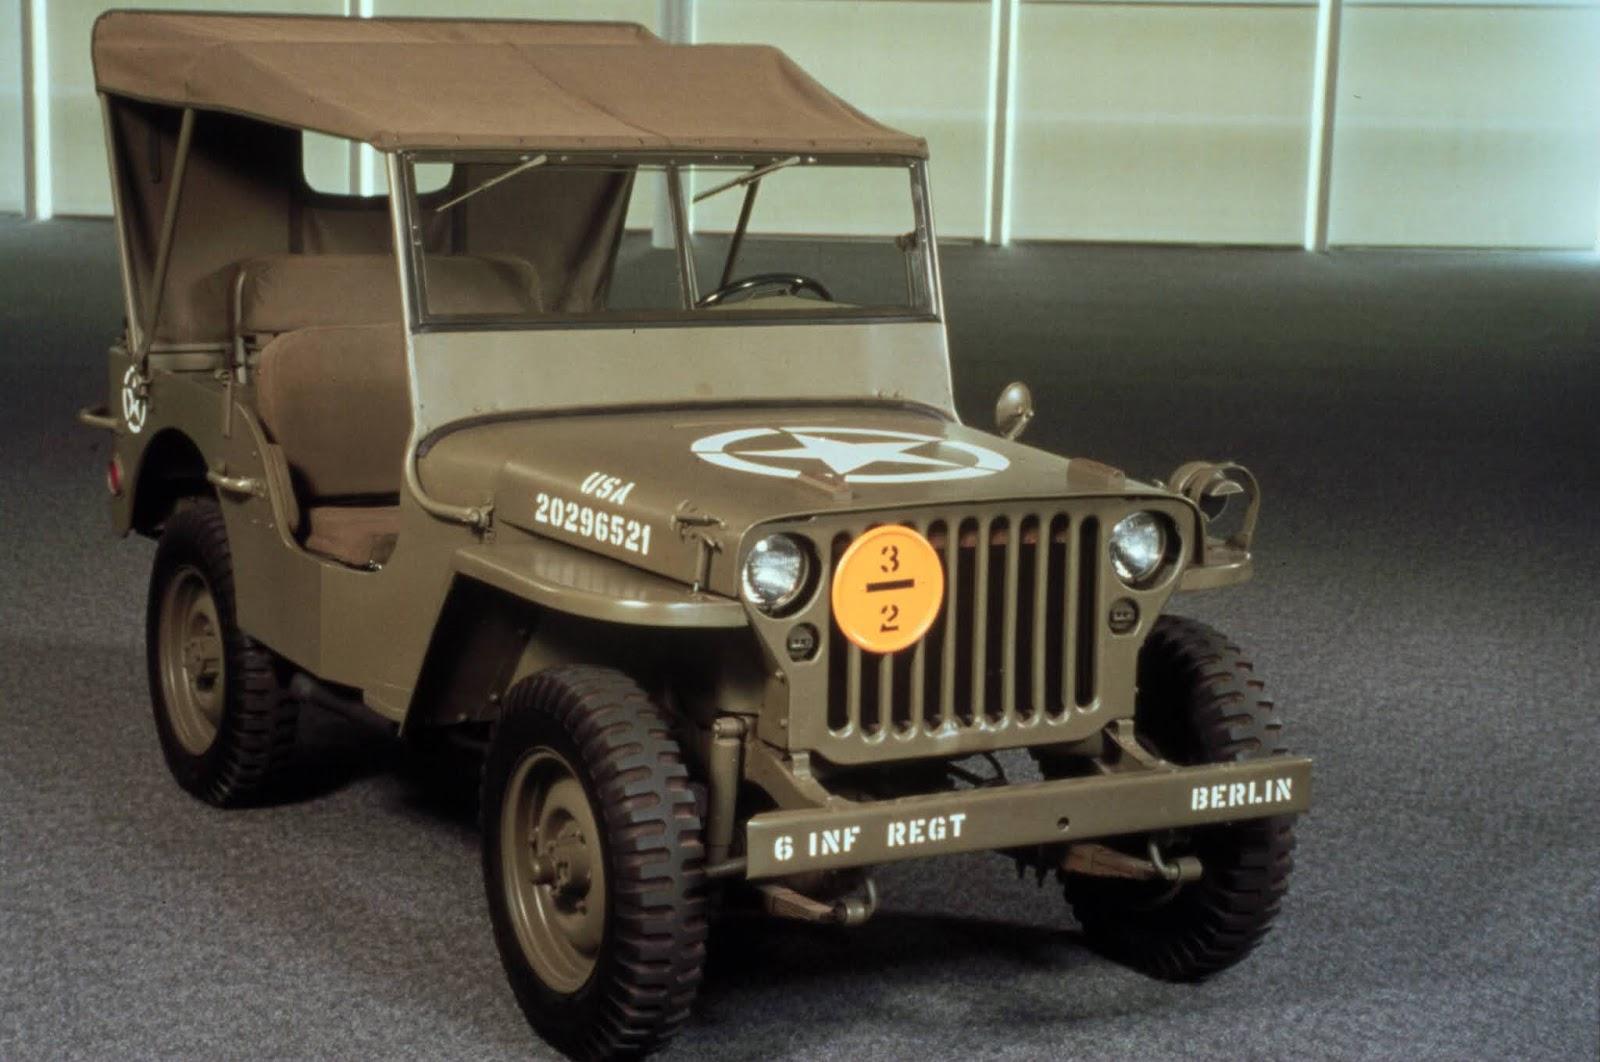 1943 Jeep MB Πώς... βασάνισαν το Jeep Willy's μέχρι να φτάσει στην παραγωγή Jeep, Jeep Willys, video, videos, Willys, zblog, ειδήσεις, ιστορικα